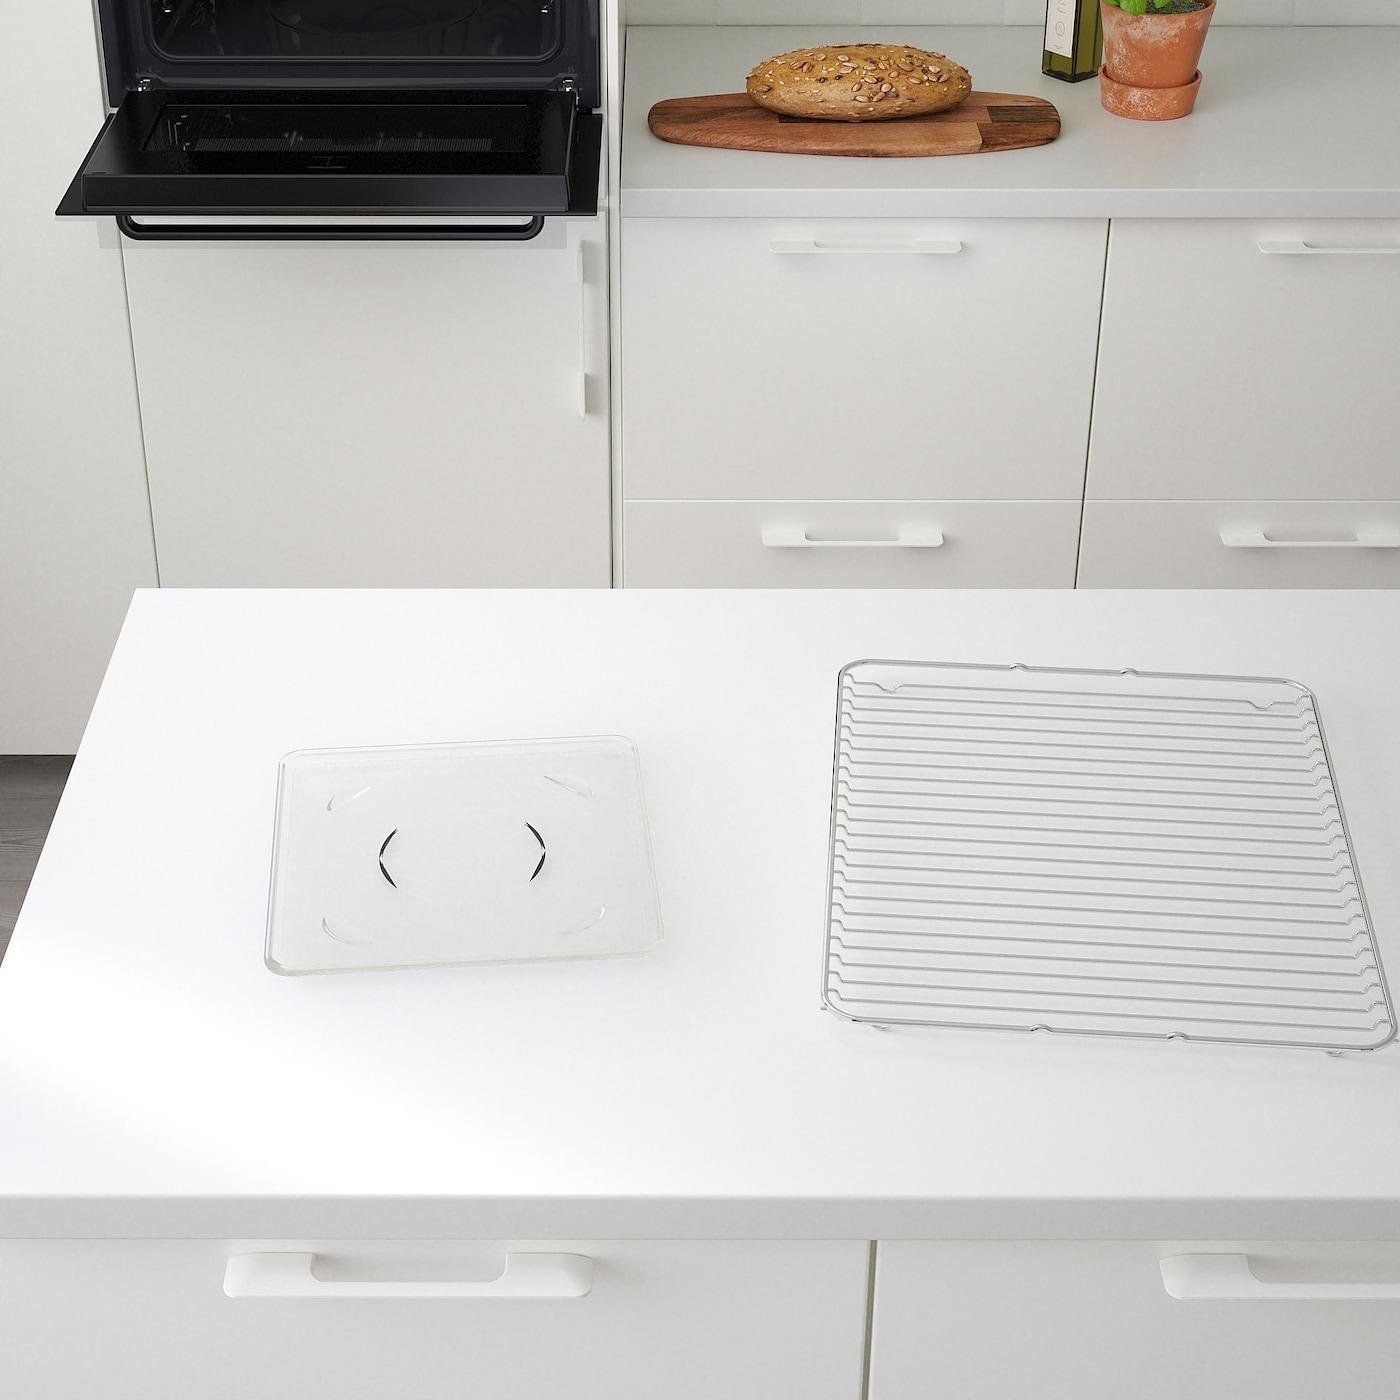 ikea kitchen planner not working on mac